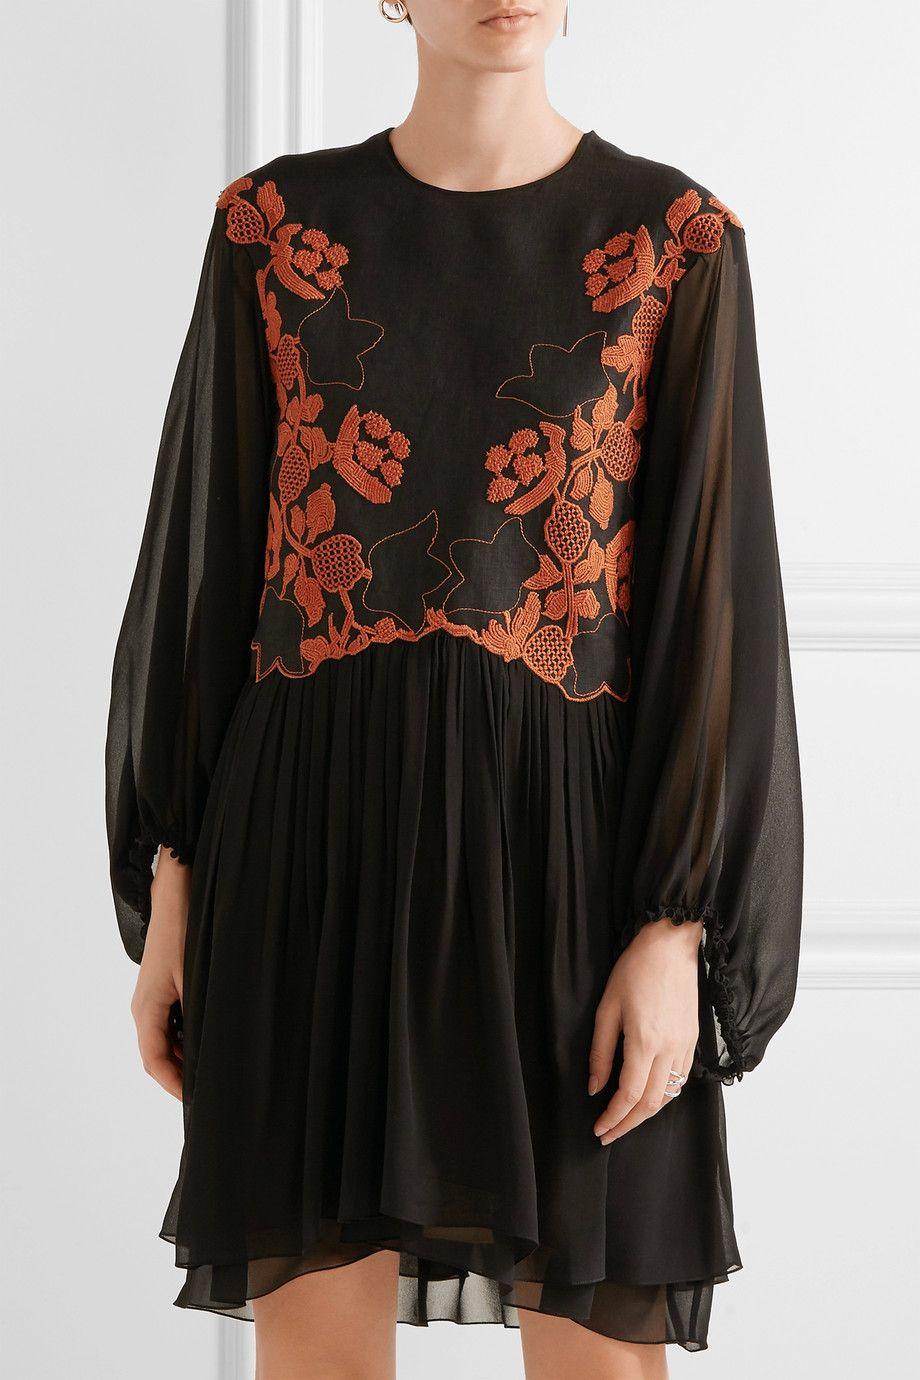 Chloé embroidered linen and silkchiffon mini dress netaporter